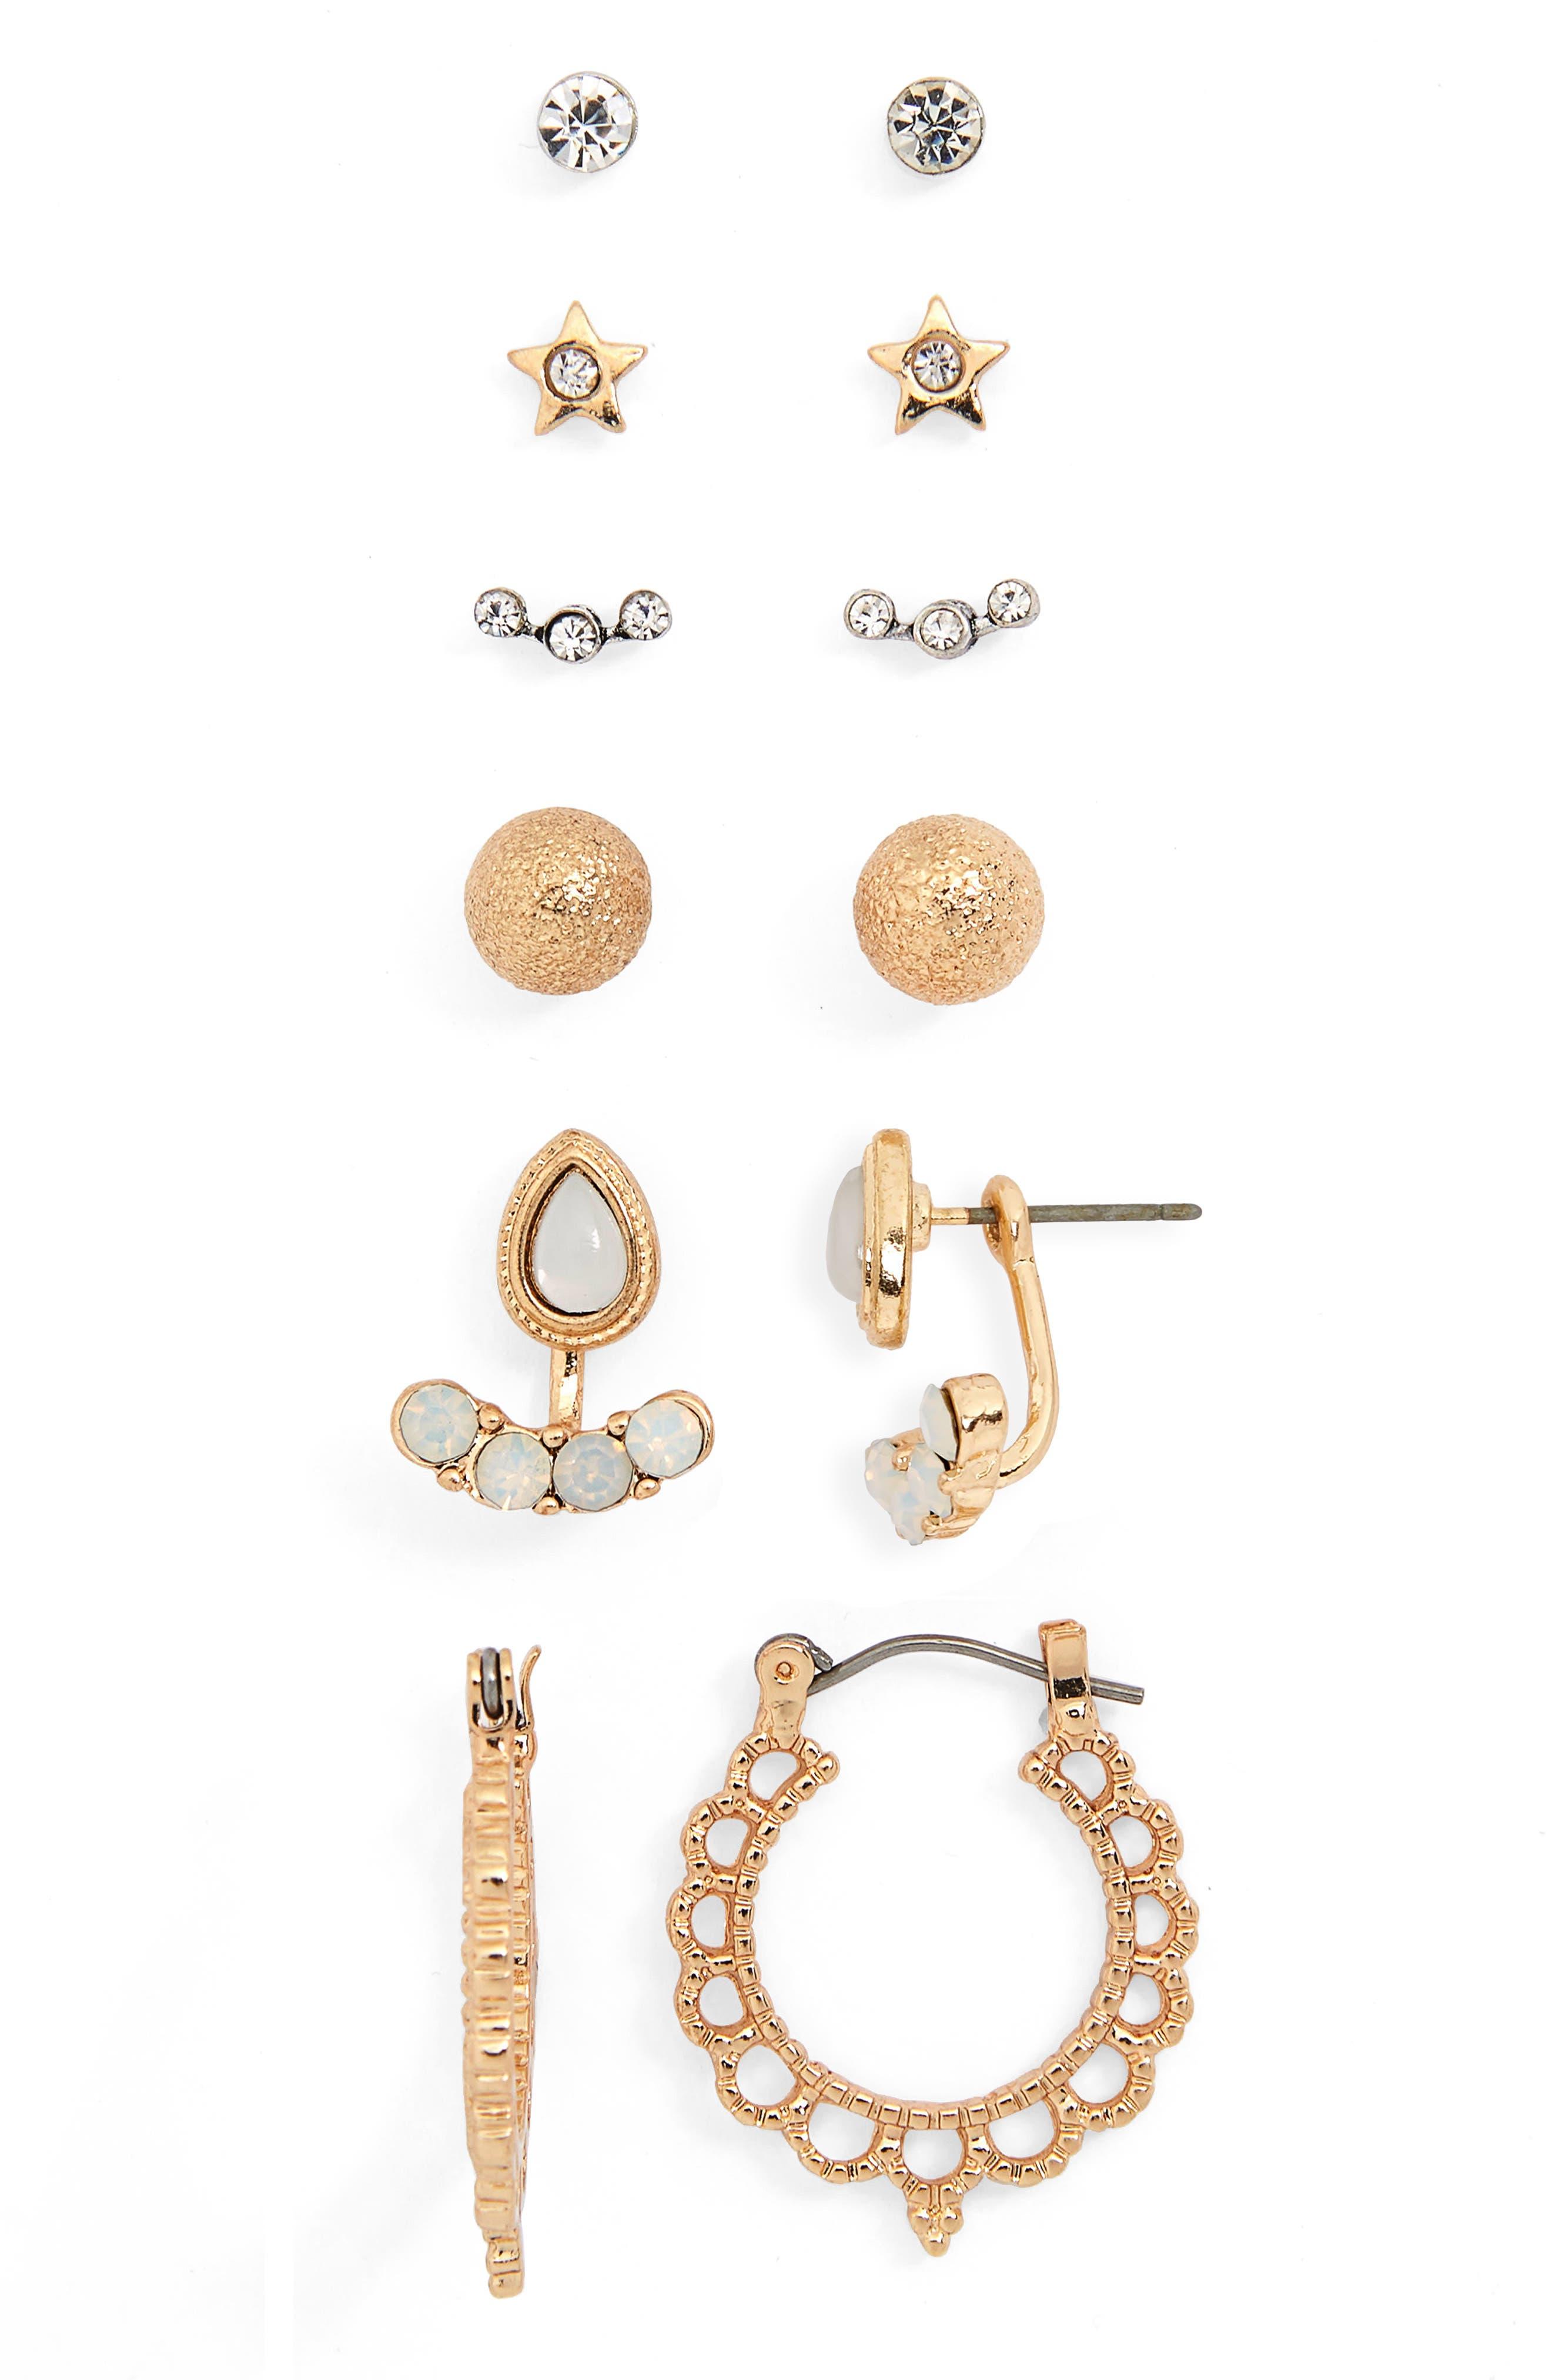 6-Pack Crystal Cluster Earrings,                         Main,                         color, 710